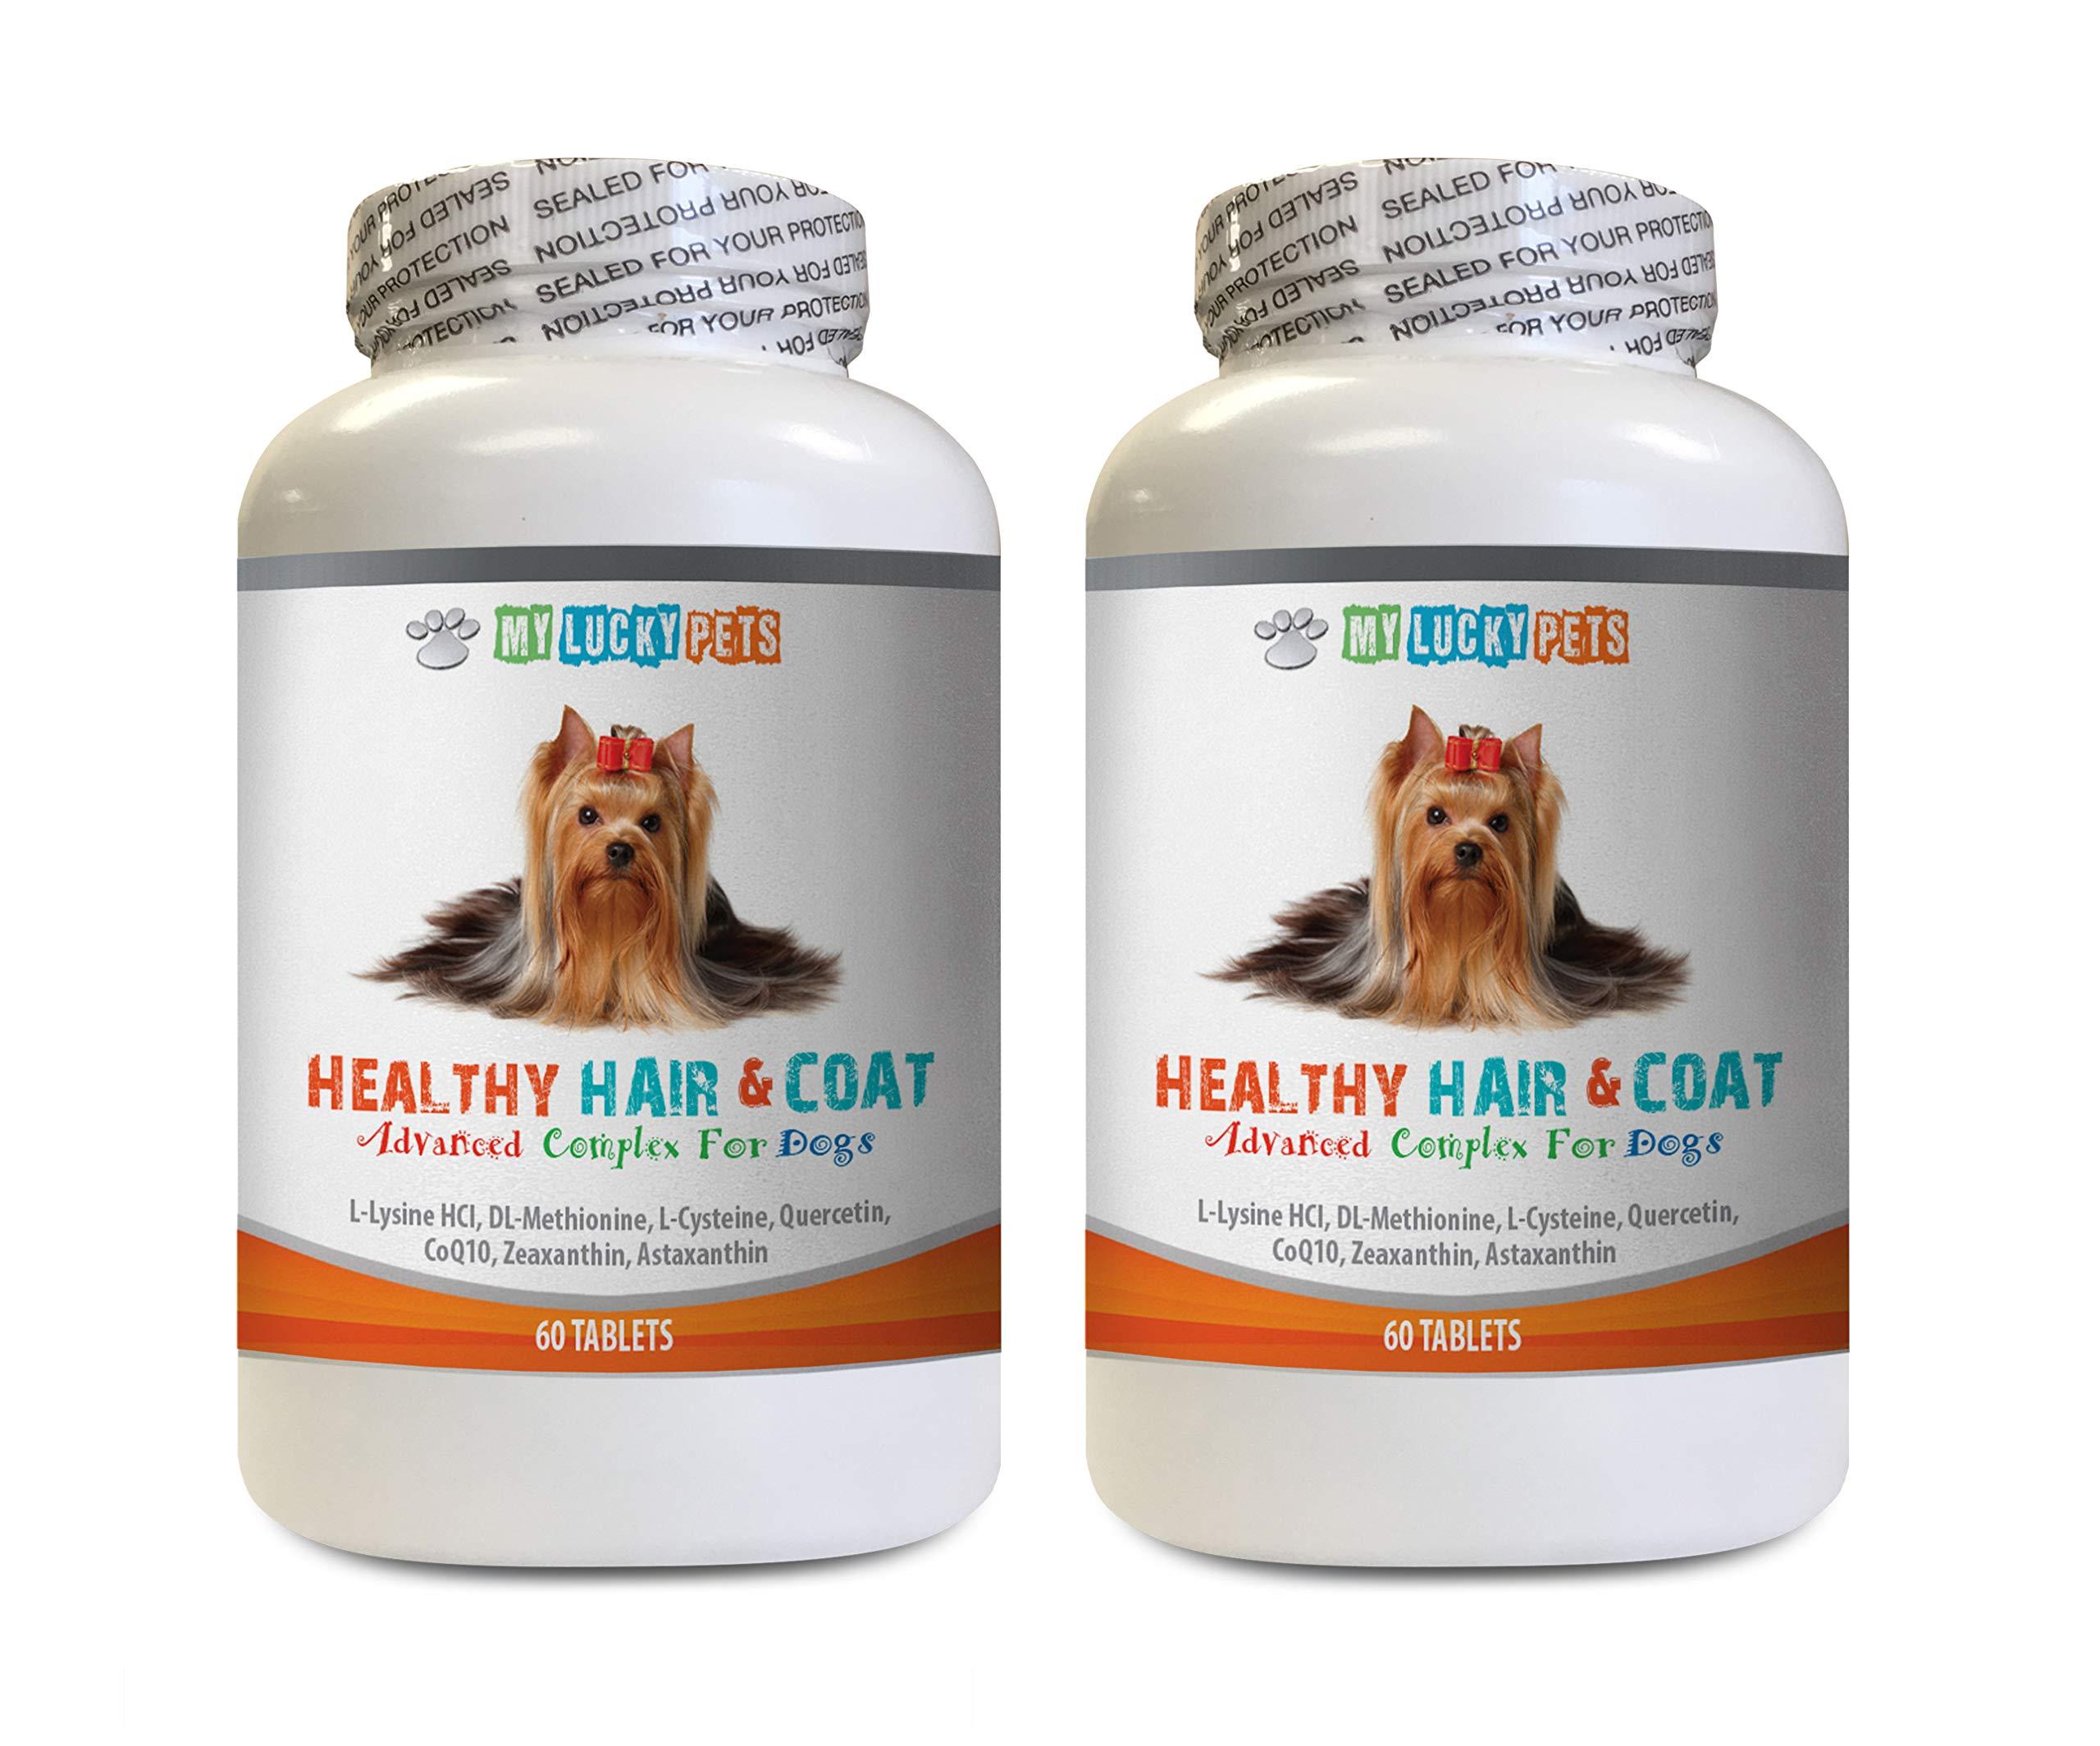 MY LUCKY PETS LLC Dog Skin Treats - Dog Healthy Hair and Coat - Shinny Coat - Skin Health - Immune Support - Nail Health - Natural Immune Support for Dogs - 120 Treats (2 Bottles) by MY LUCKY PETS LLC